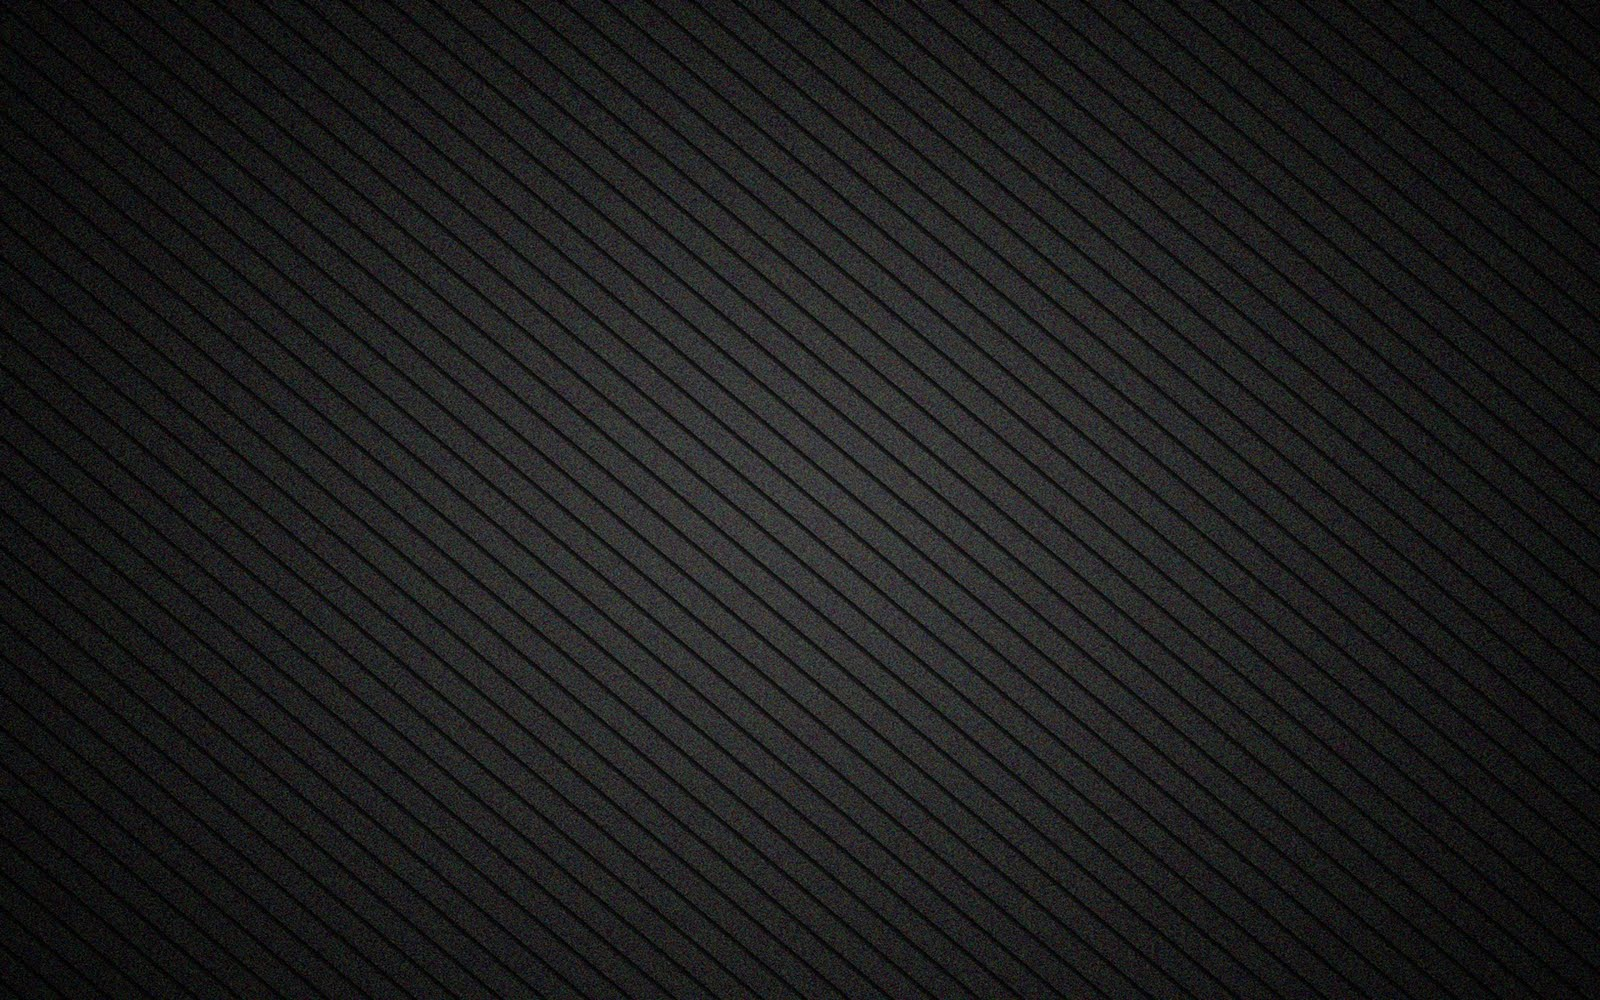 HD Wide Wallpapers: 3D Black HD Wallpapers (30)